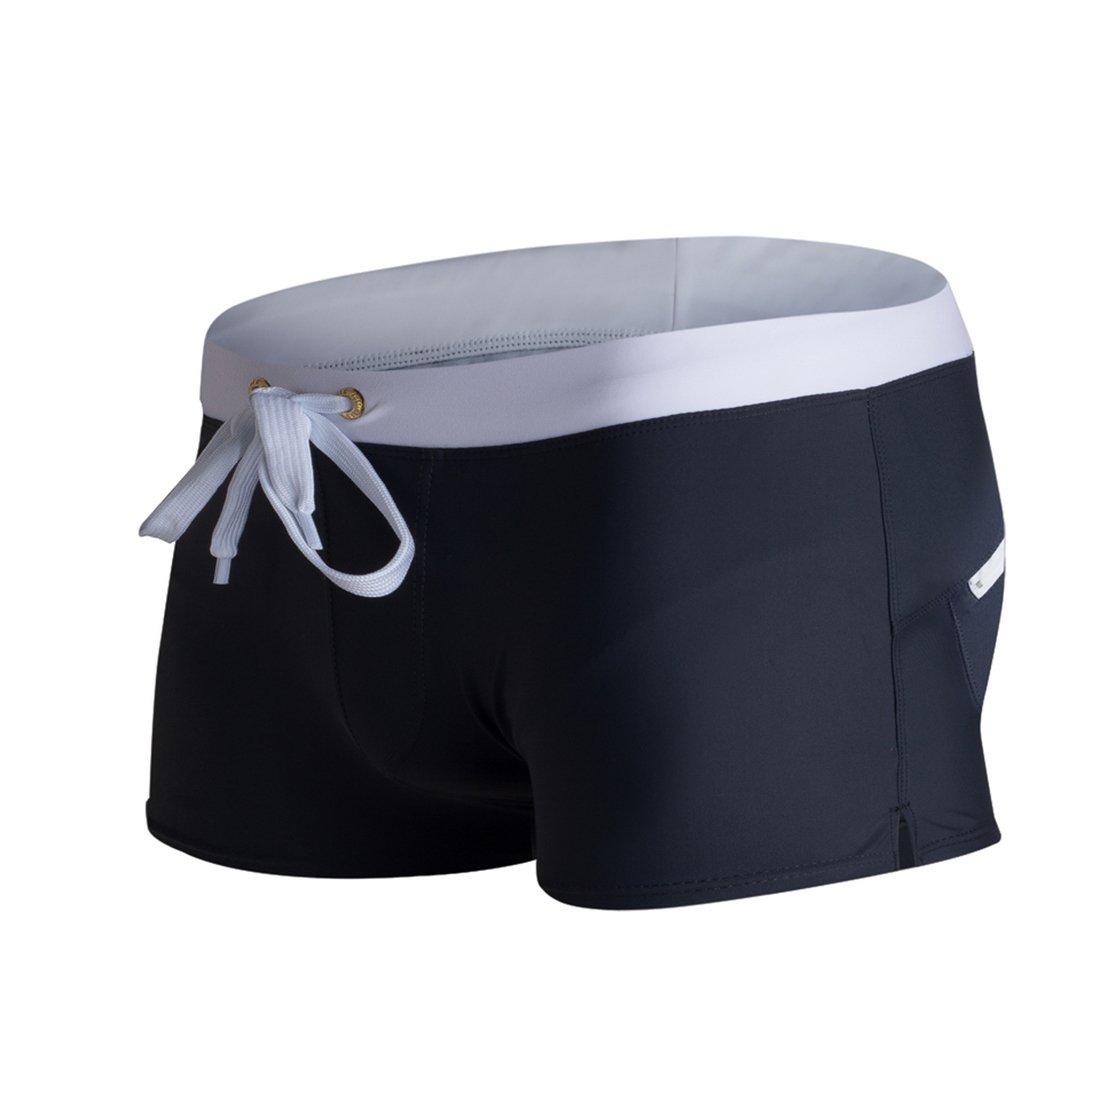 Zegoo Men's Swim Briefs Square Leg Black Swimwear Trunks Beachwear Shorts S